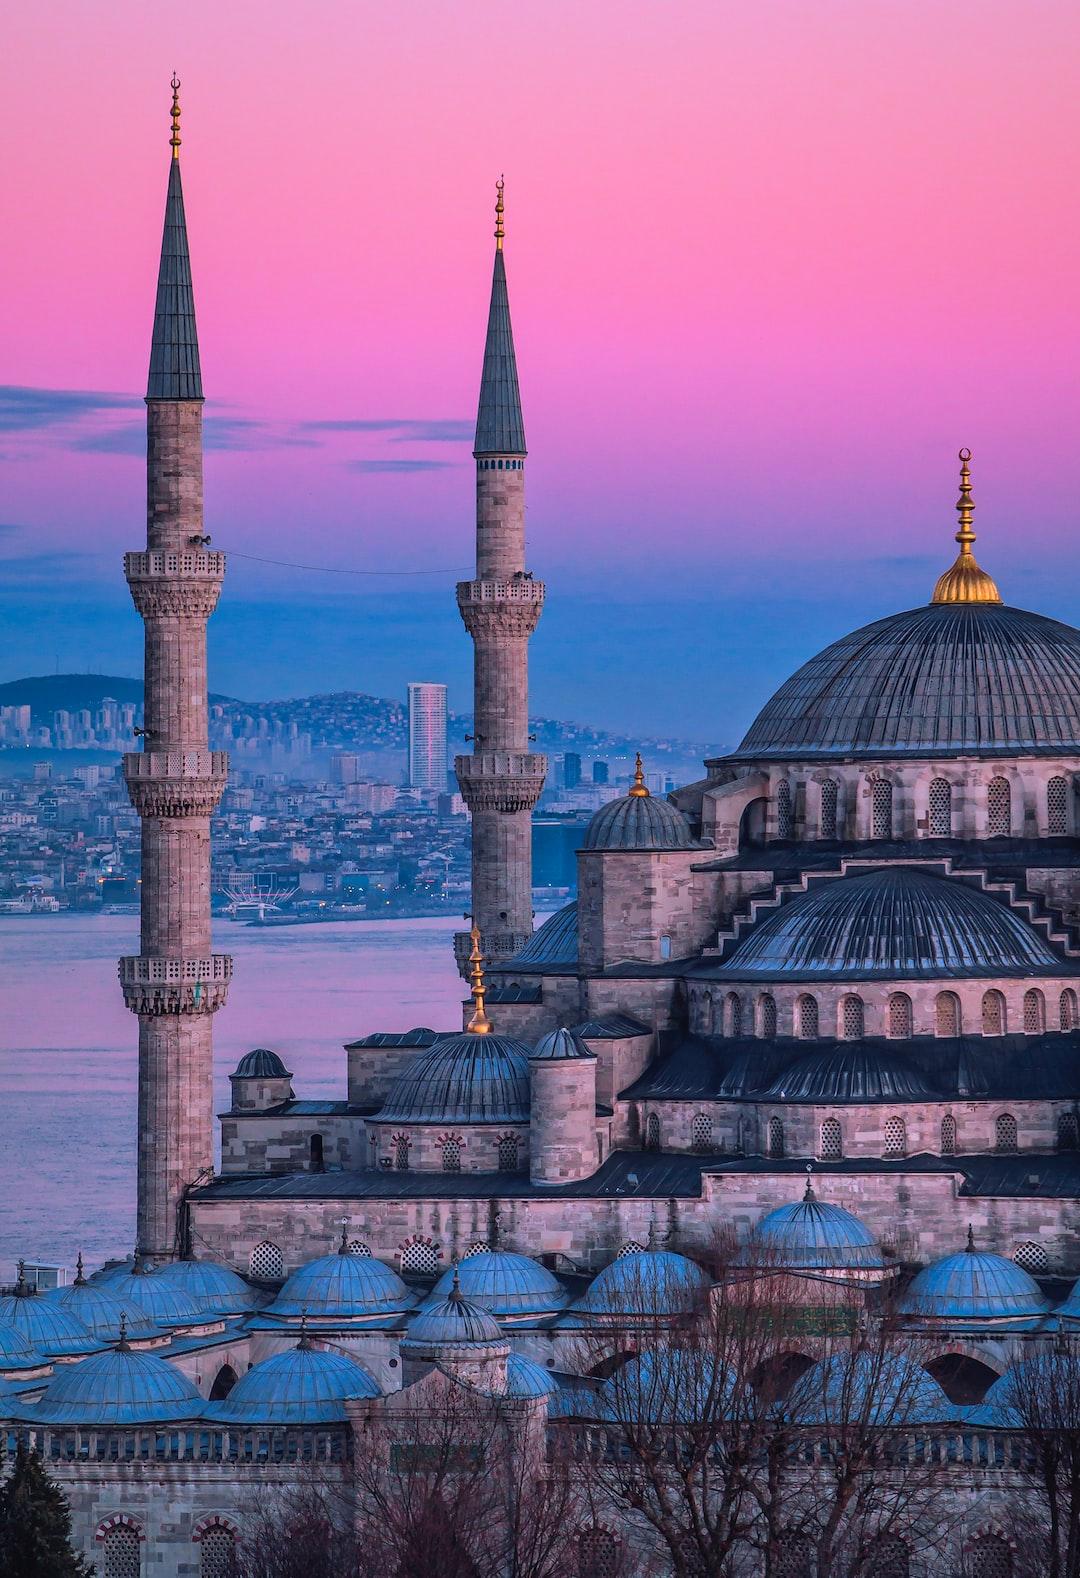 by Fatih Yürür